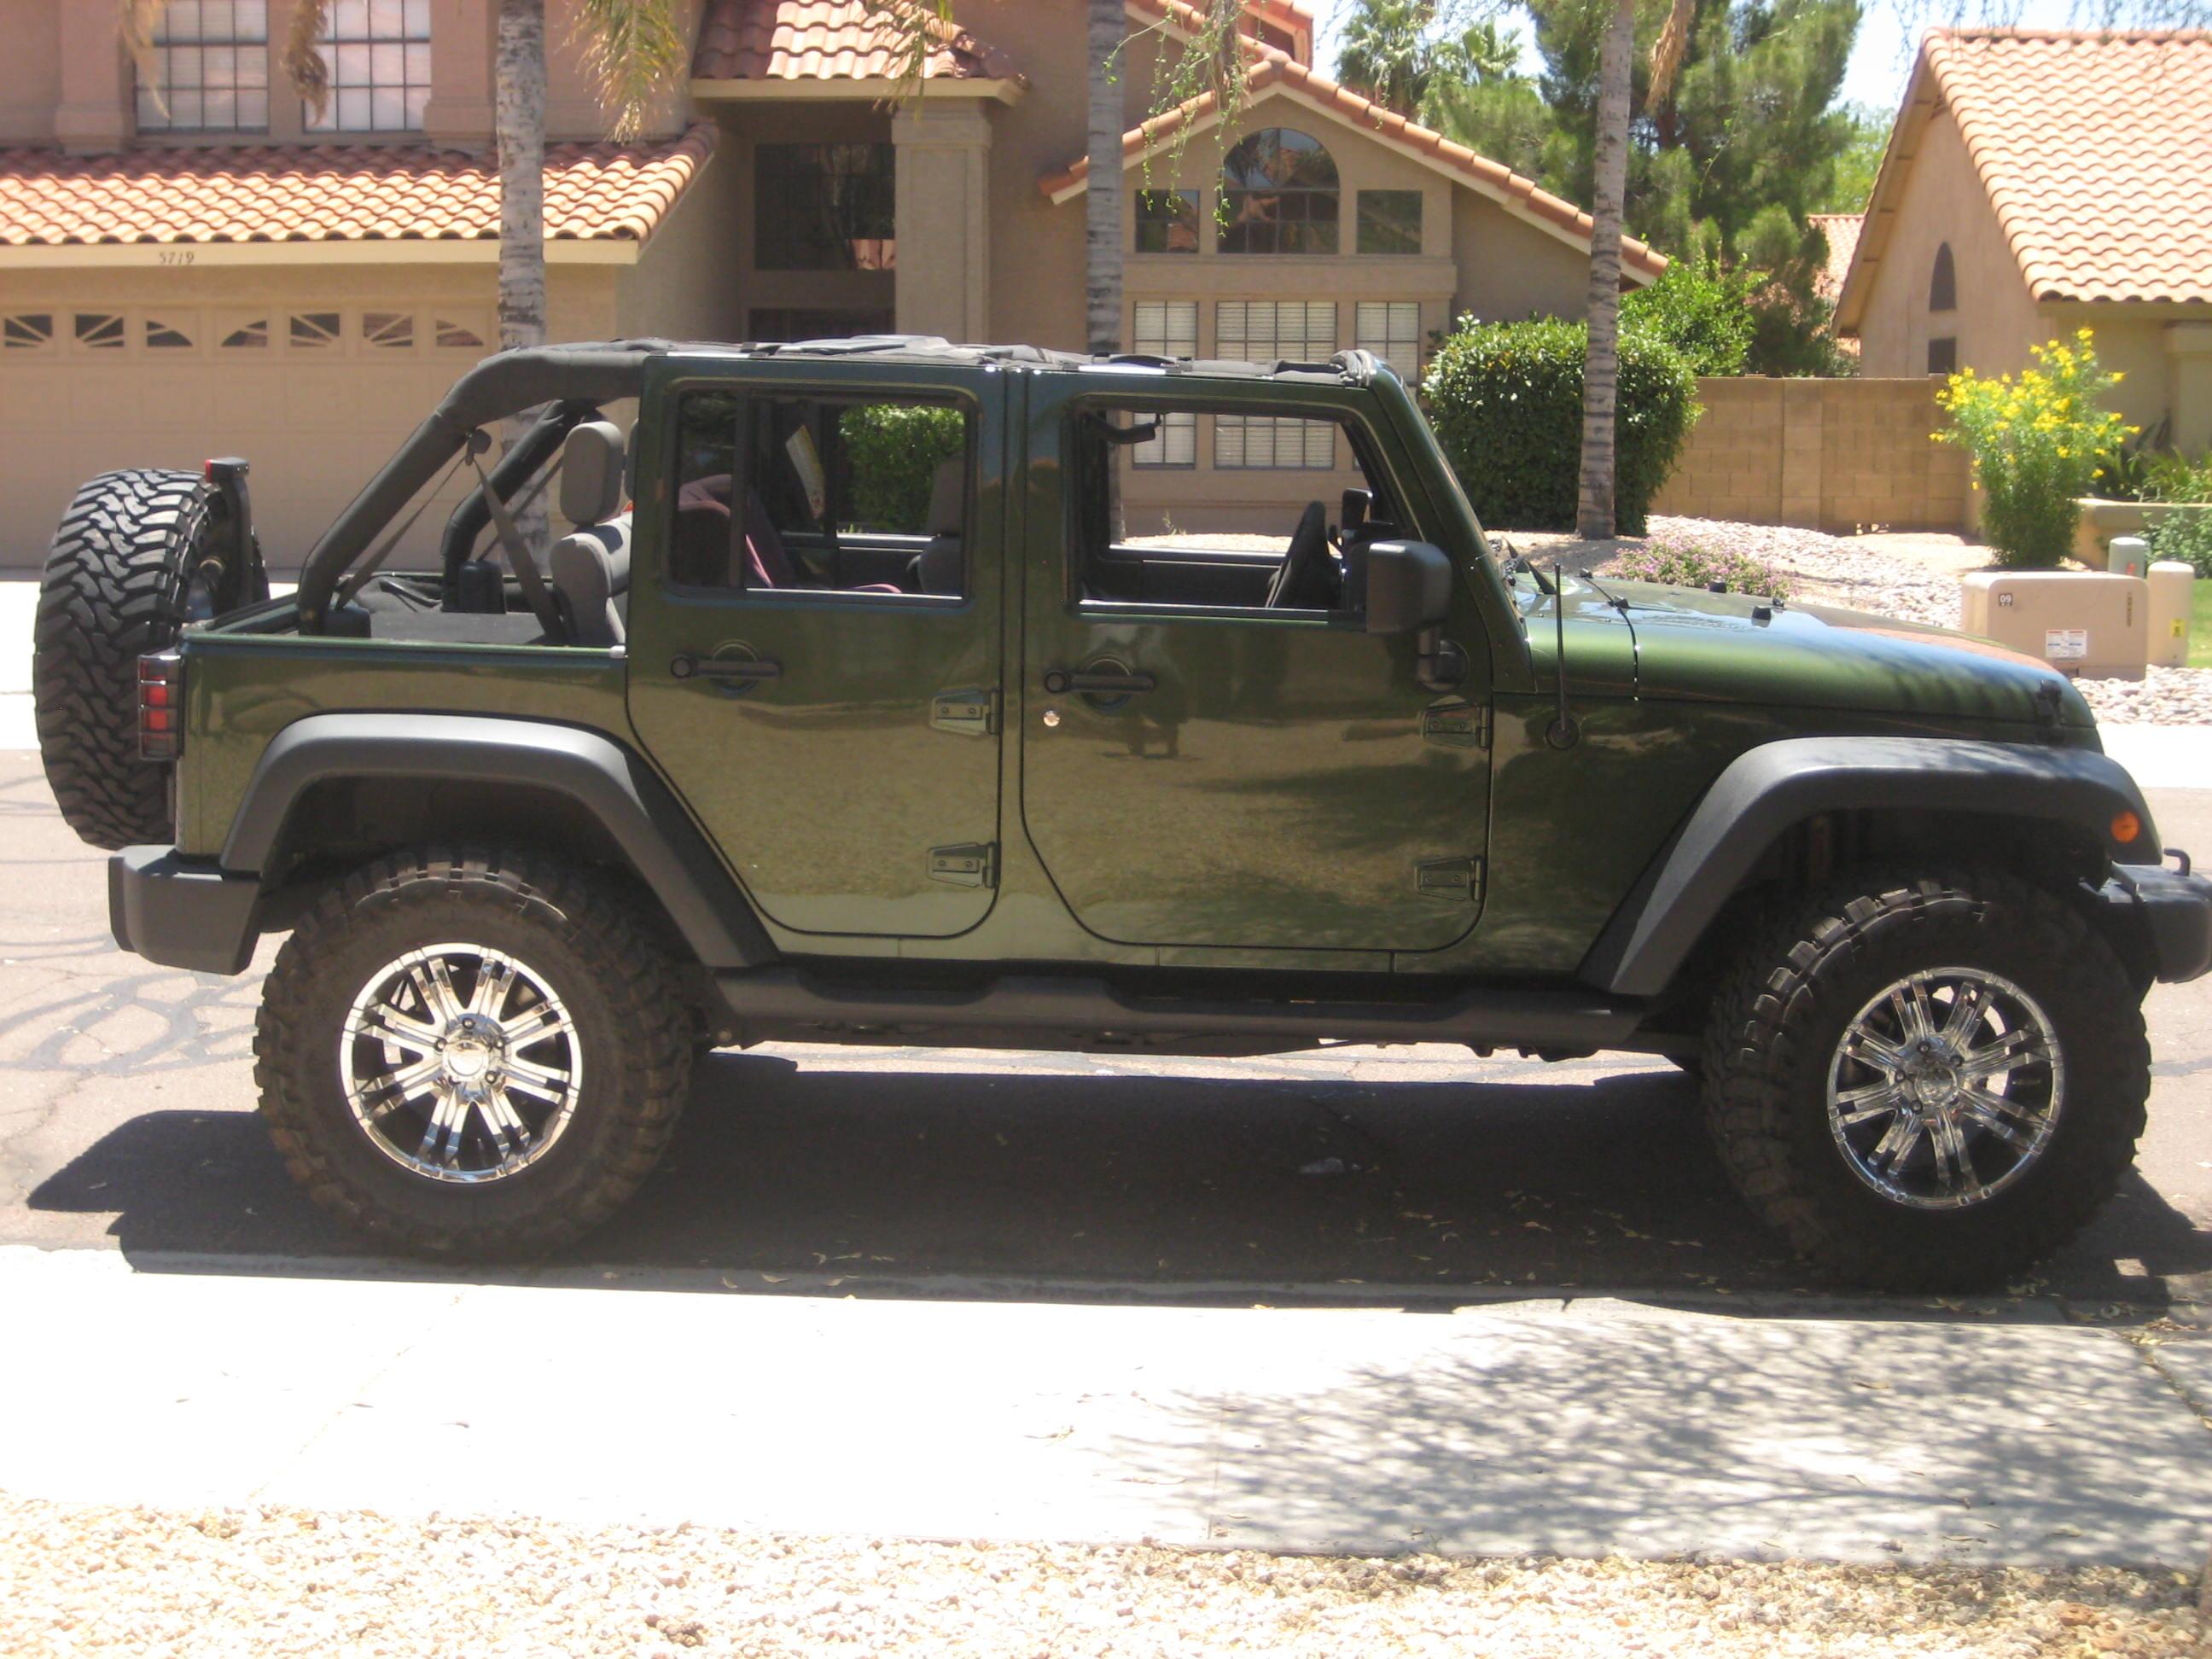 2008 jeep green wrangler unlimited 4x4 - jkowners : jeep